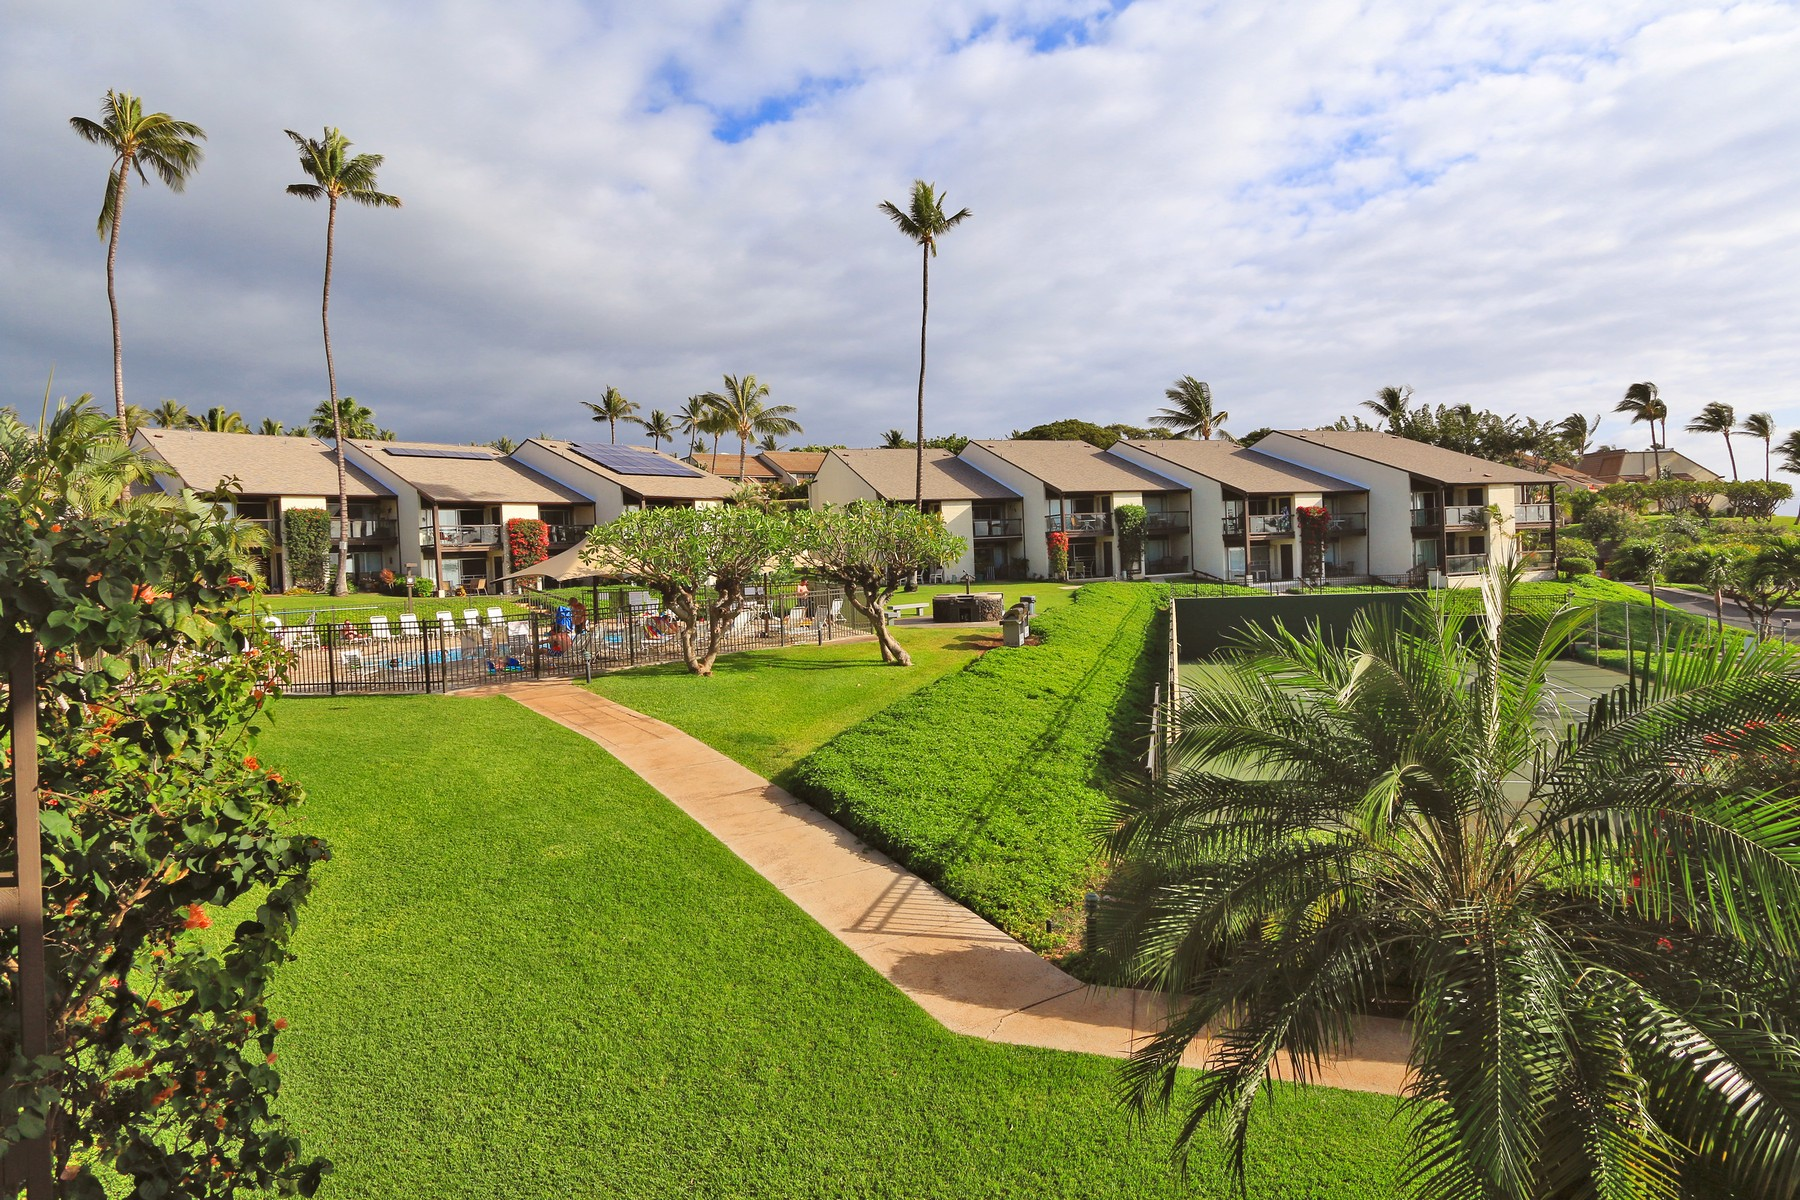 Кондоминиум для того Продажа на South Kihei Vacation Rental Winner 2737 South Kihei Road, Hale Kamaole 231 Kihei, Гавайи, 96753 Соединенные Штаты